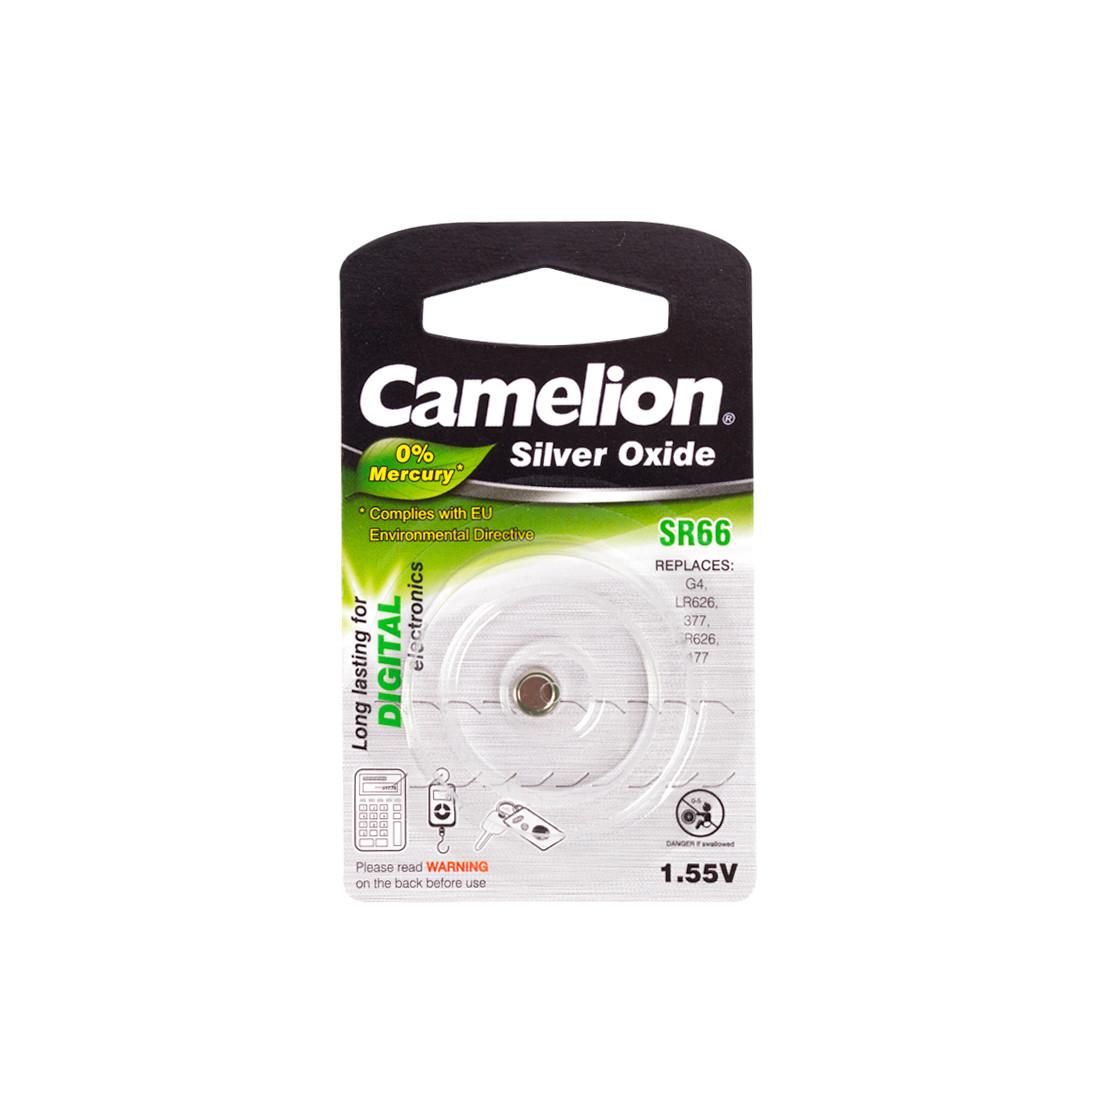 Батарейка CAMELION SR66-BP1(0%Hg)  Silver Oxide 1.55V 0% Ртути 1 шт. Блистер